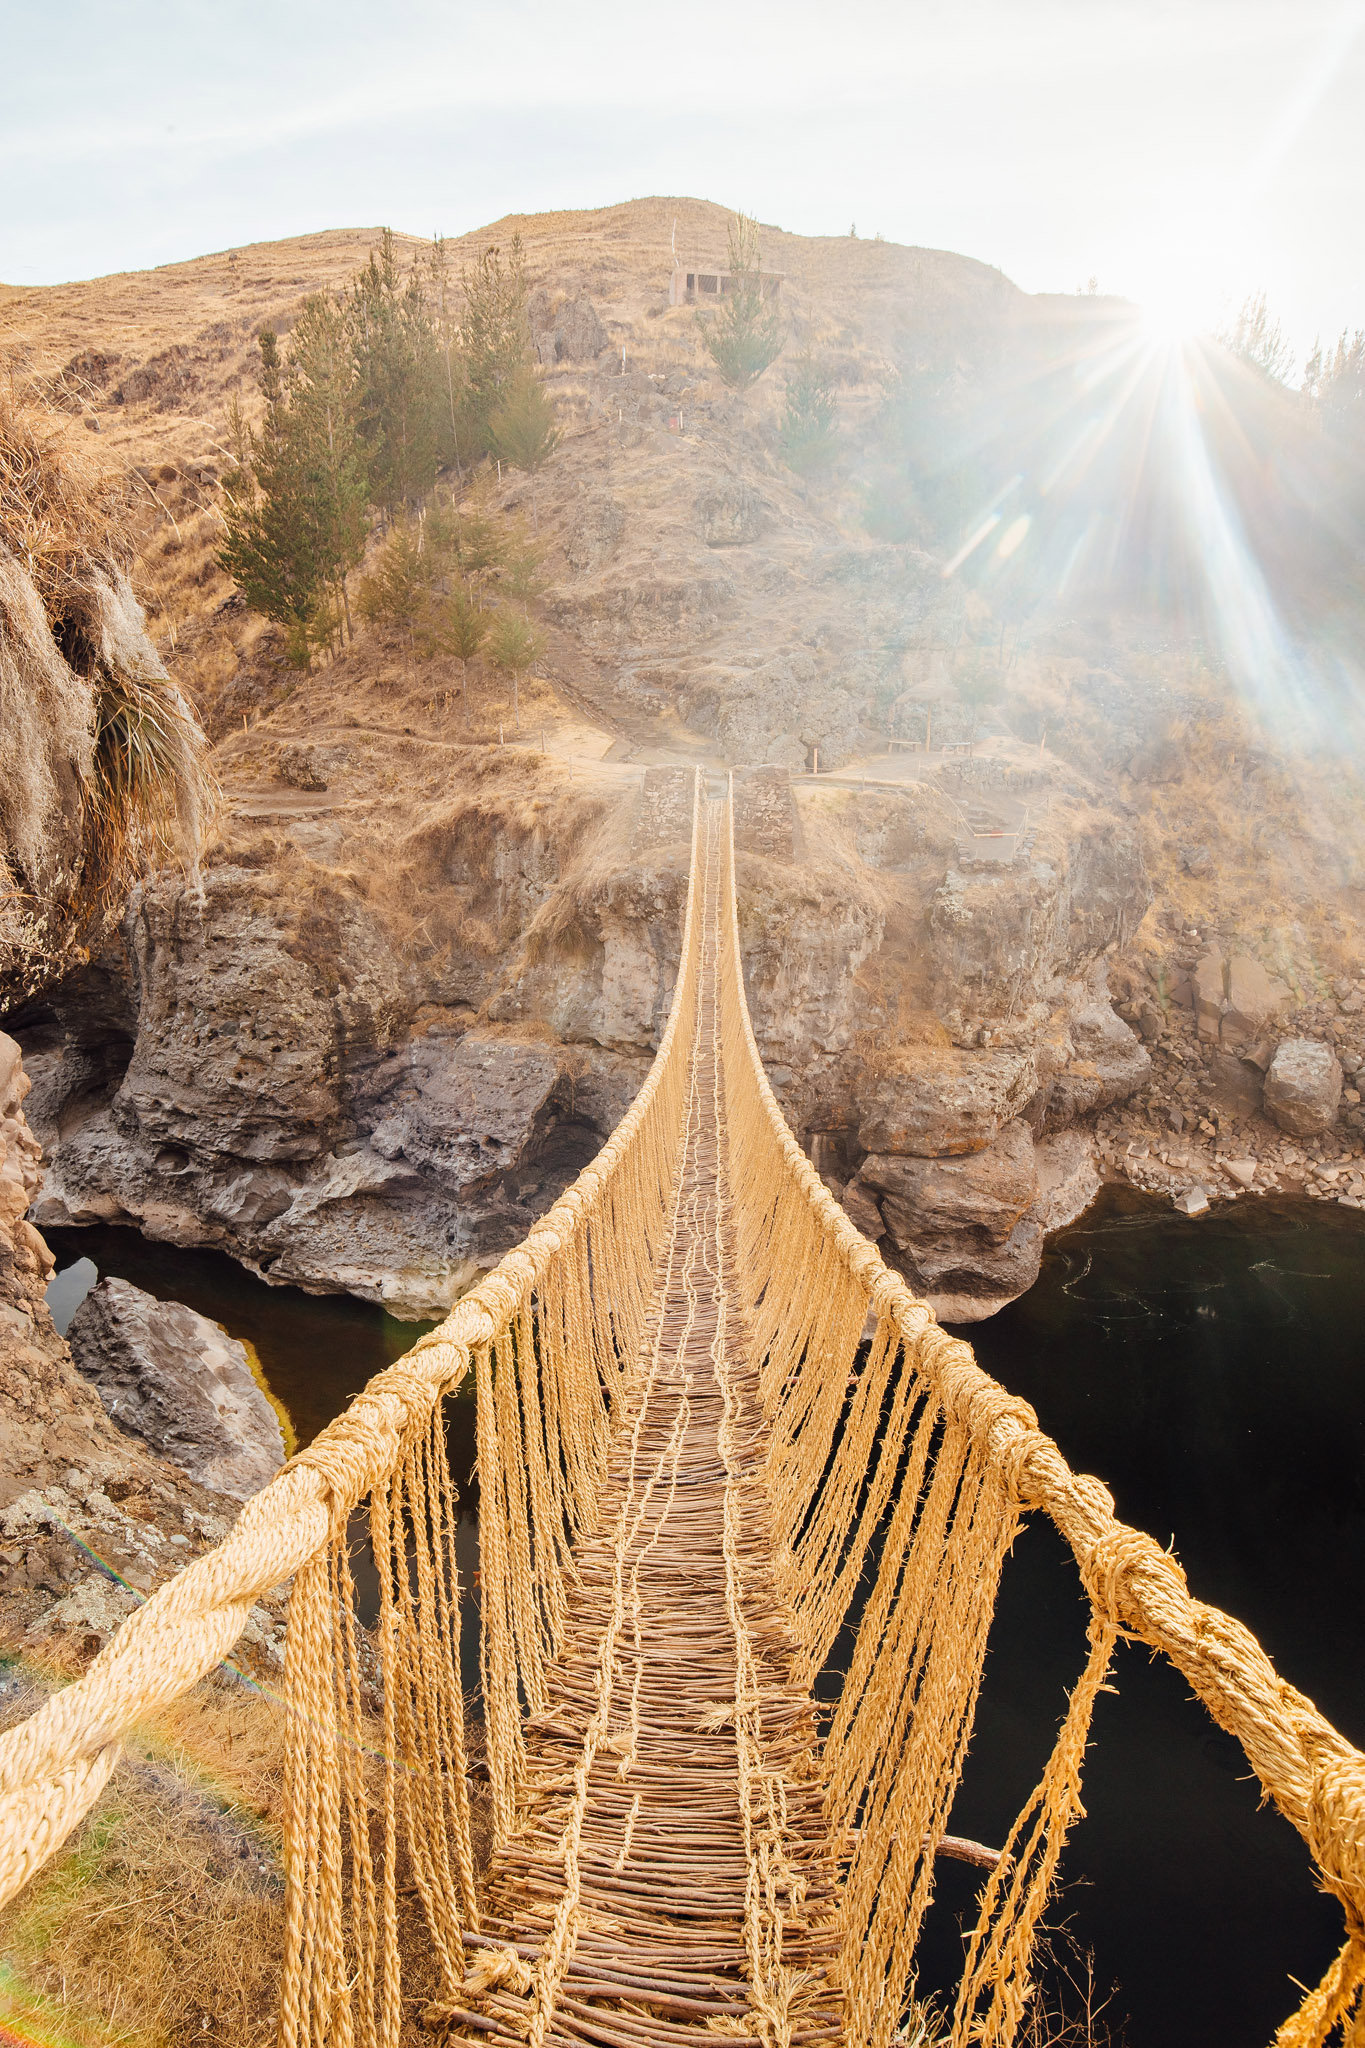 travel-photography-overlanding-apurimac-valley-peru-queswachaka-last-inca-bridge-11.jpg